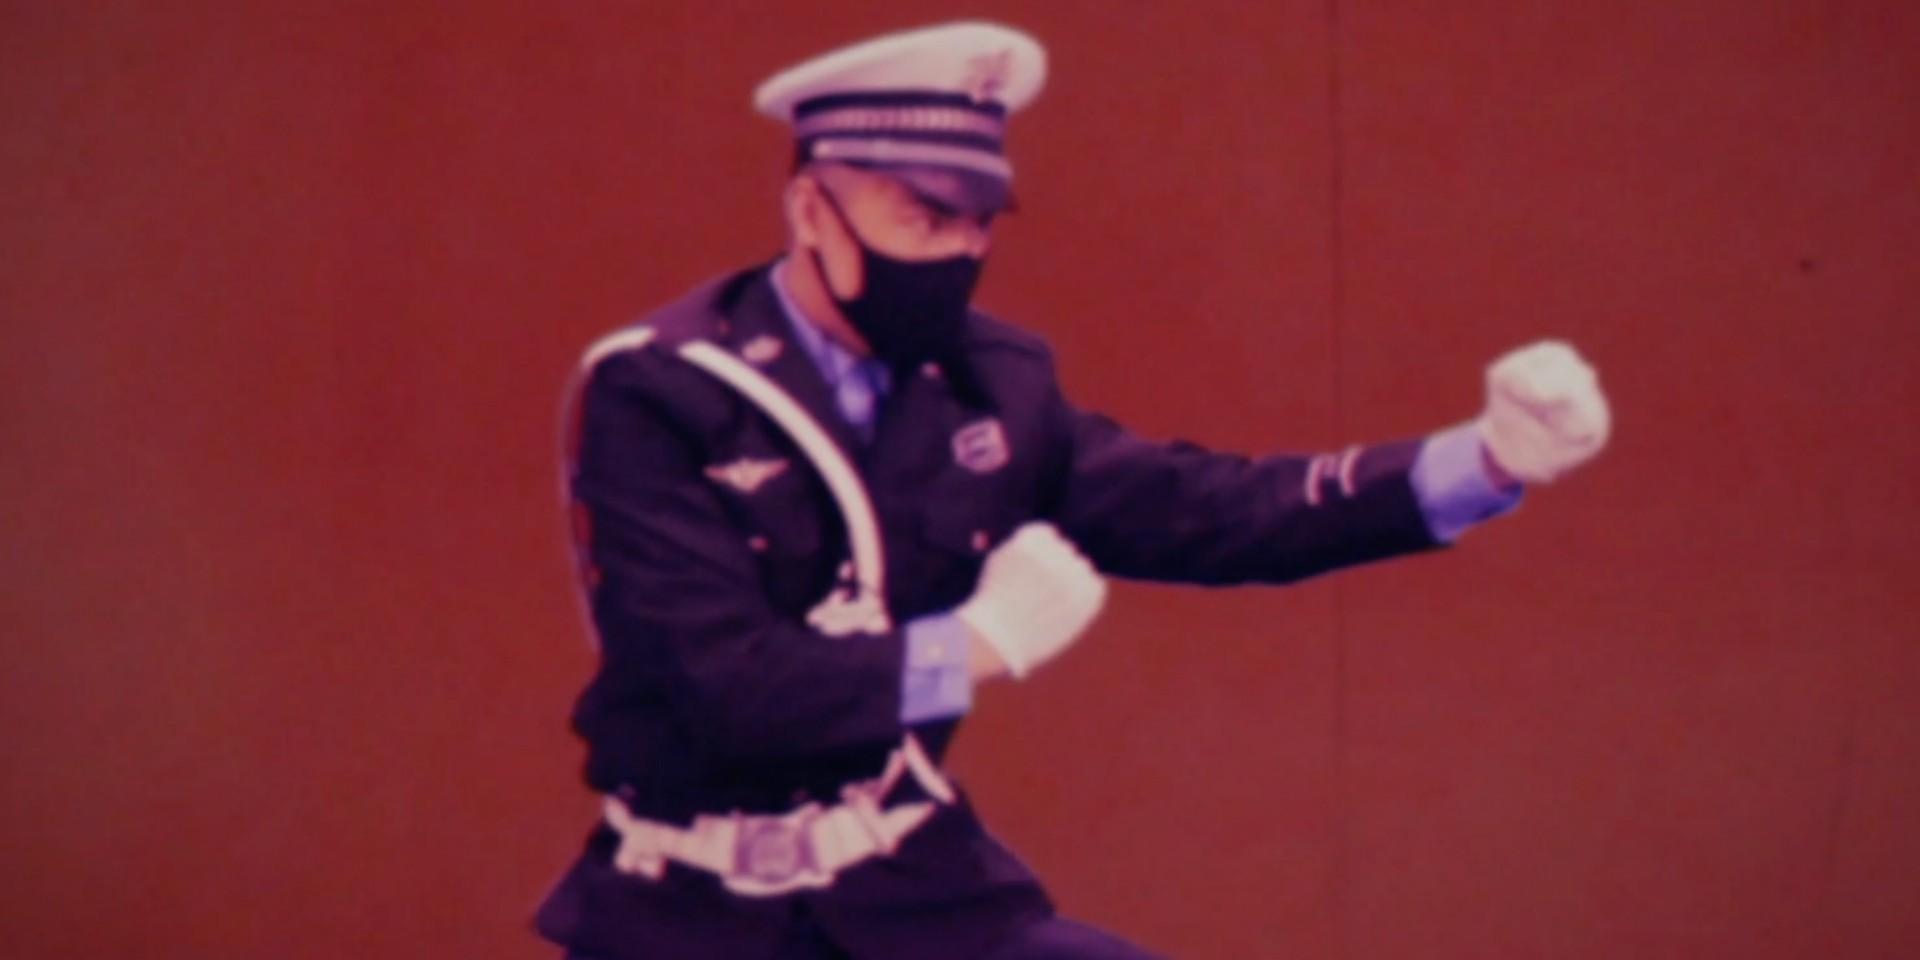 W.Y. Huang fka Yllis soundtracks next-level kung fu-inspired film Dukkha